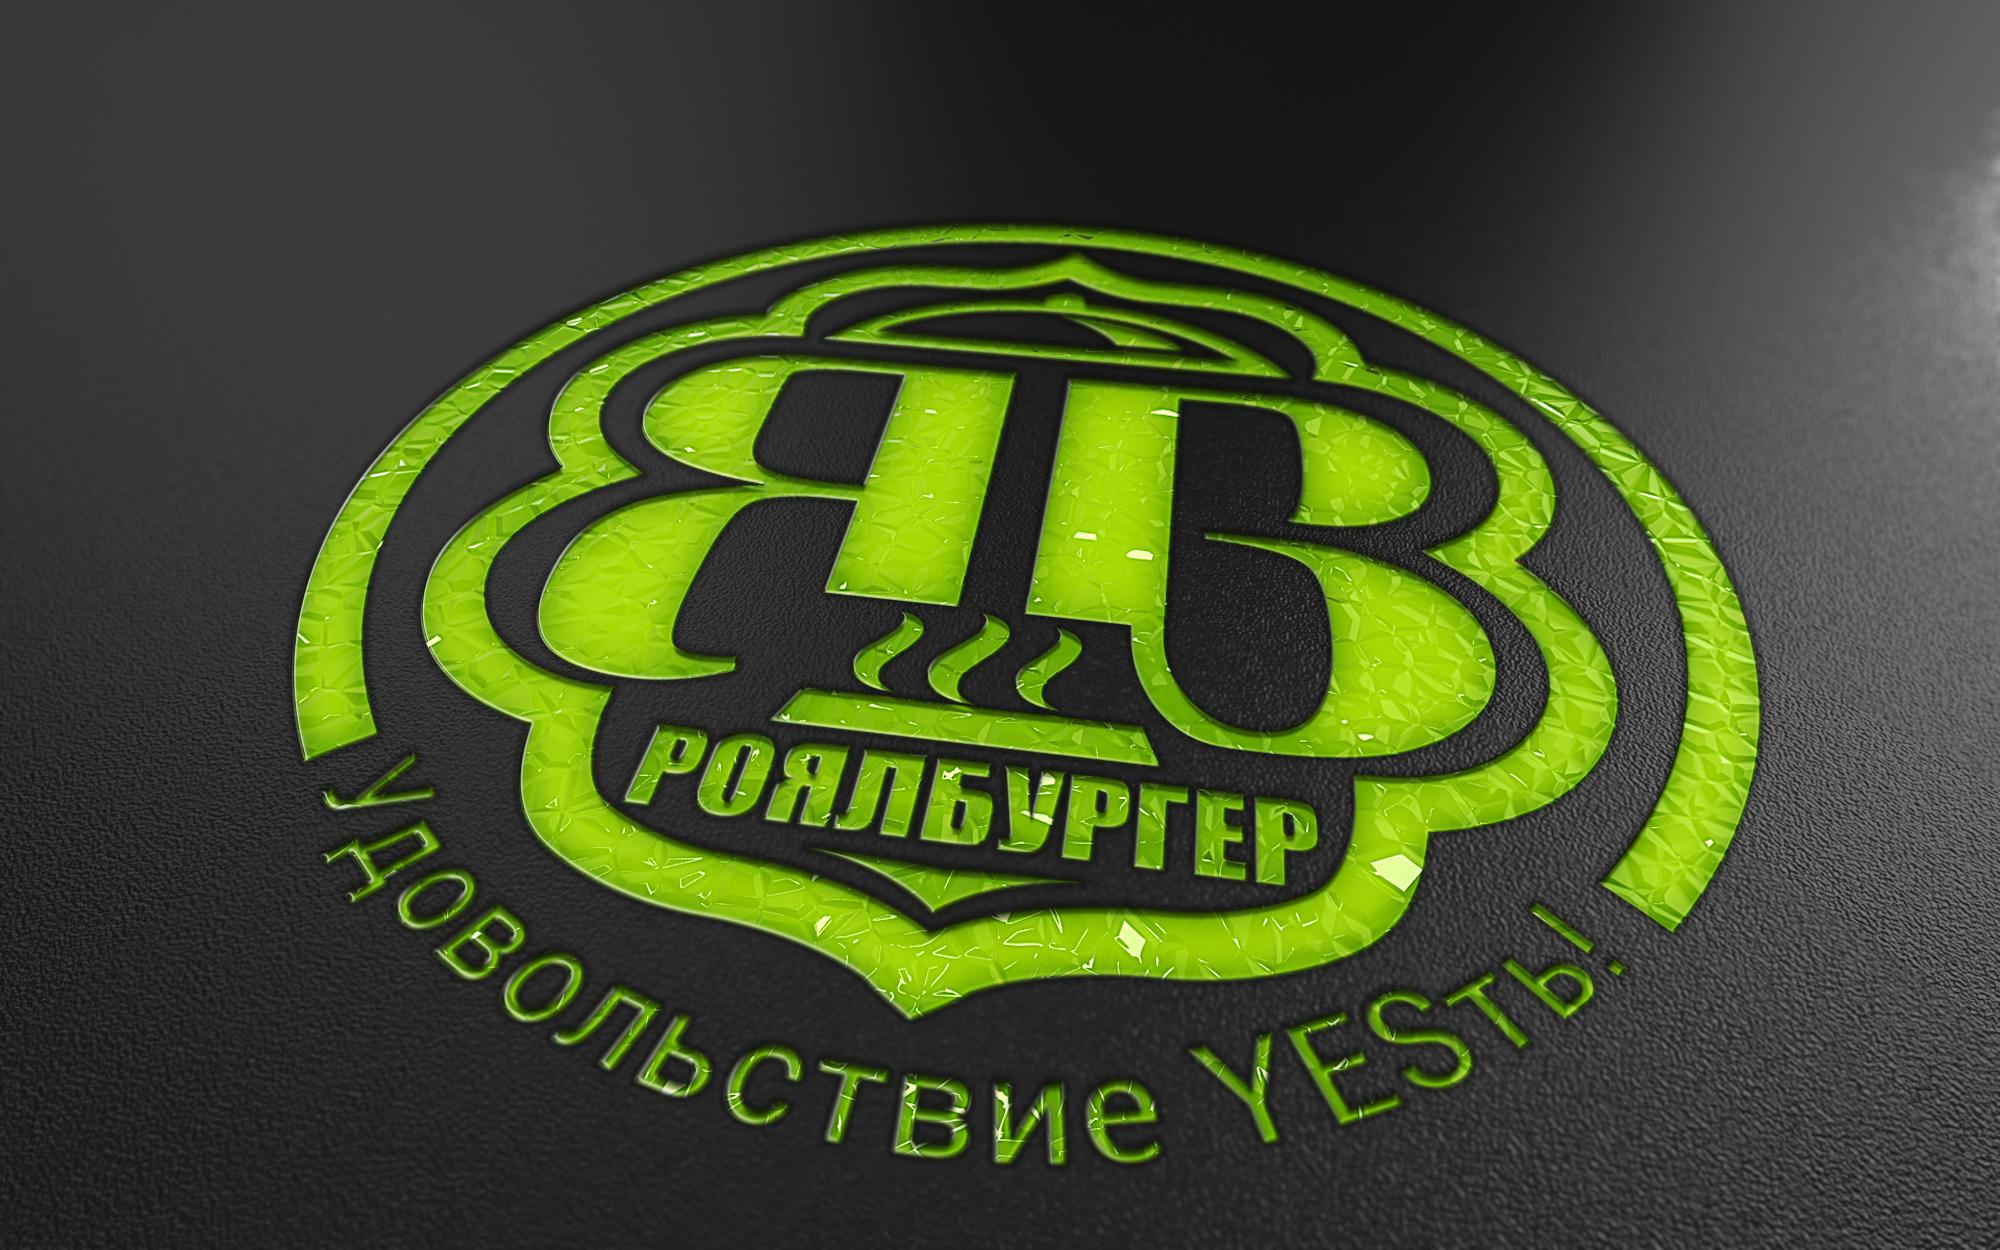 Обновление логотипа фото f_48659c96ba8ab61c.jpg